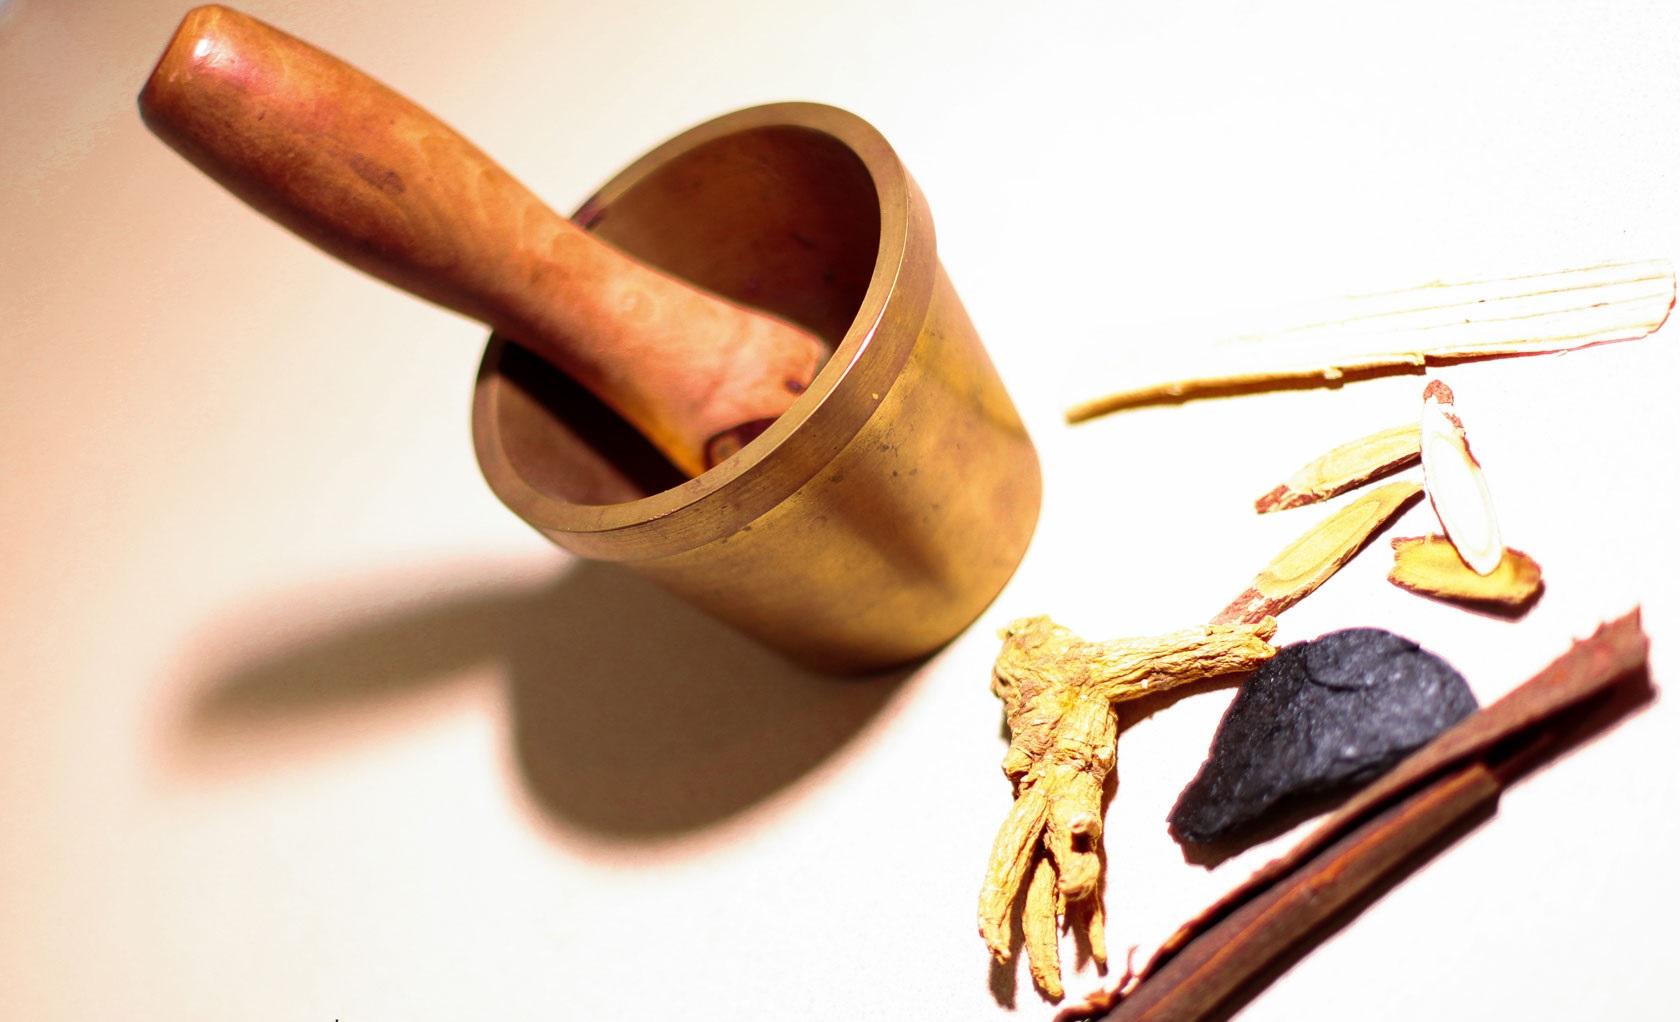 ۷ تفاوت اصلی بین طب سوزنی چینی و طب سوزنی ژاپنی